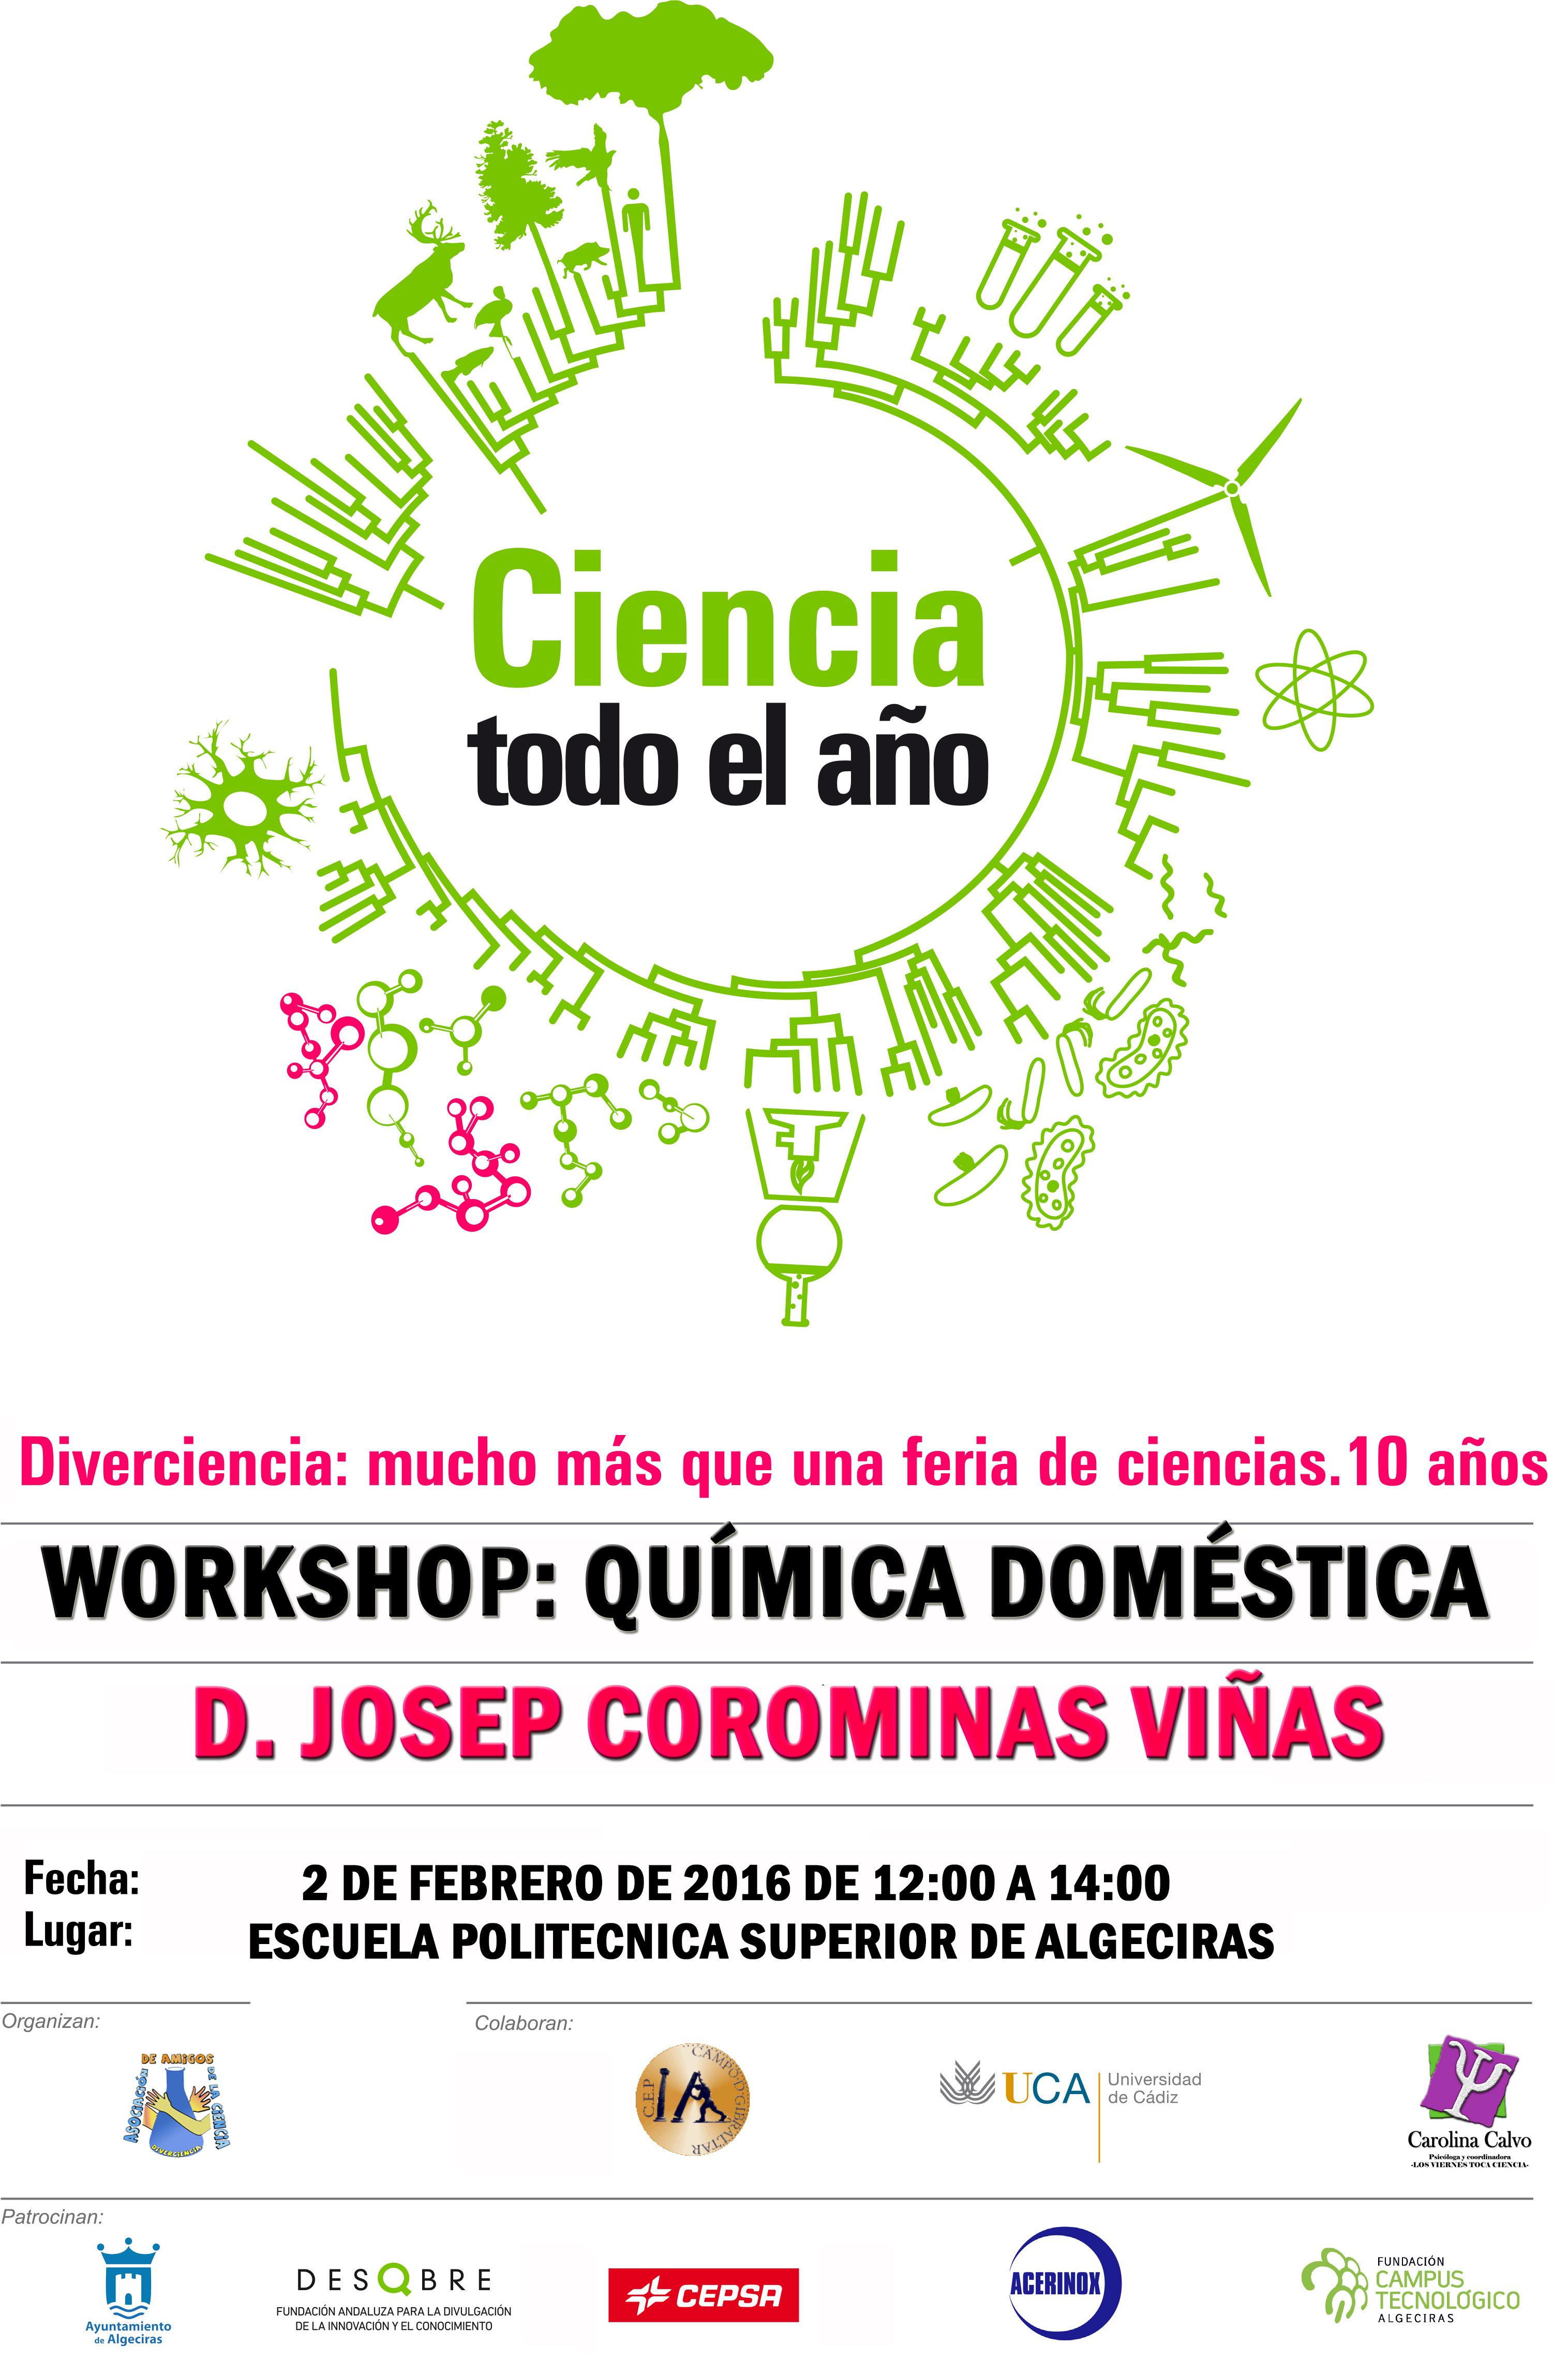 WORKSHOP: QUíMICA DOMÉSTICA